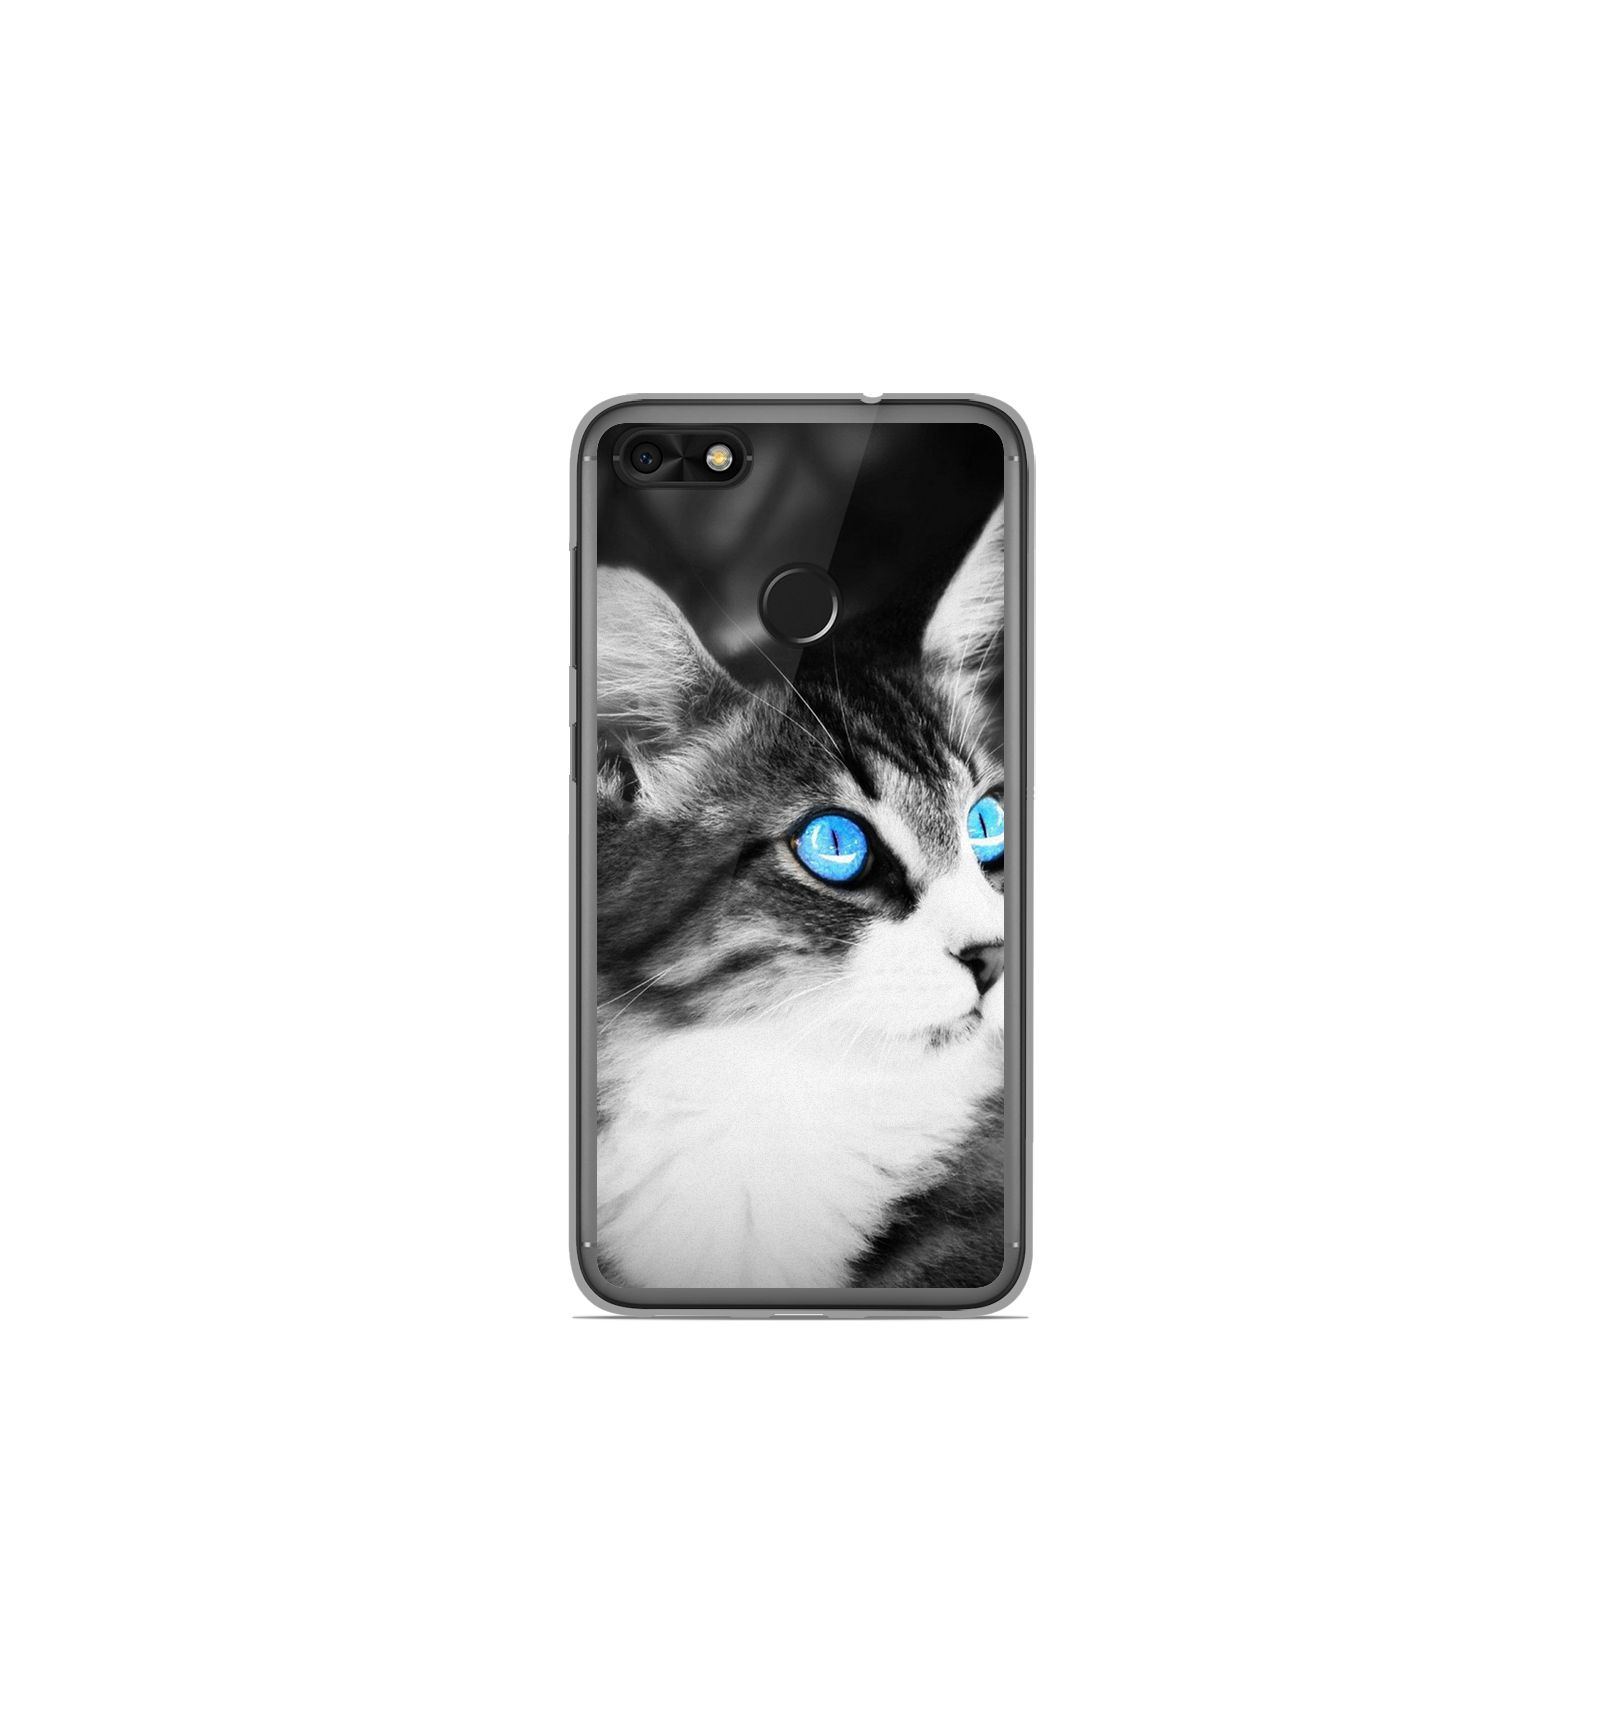 Coque en silicone Huawei Y6 Pro 2017 - Chat yeux bleu